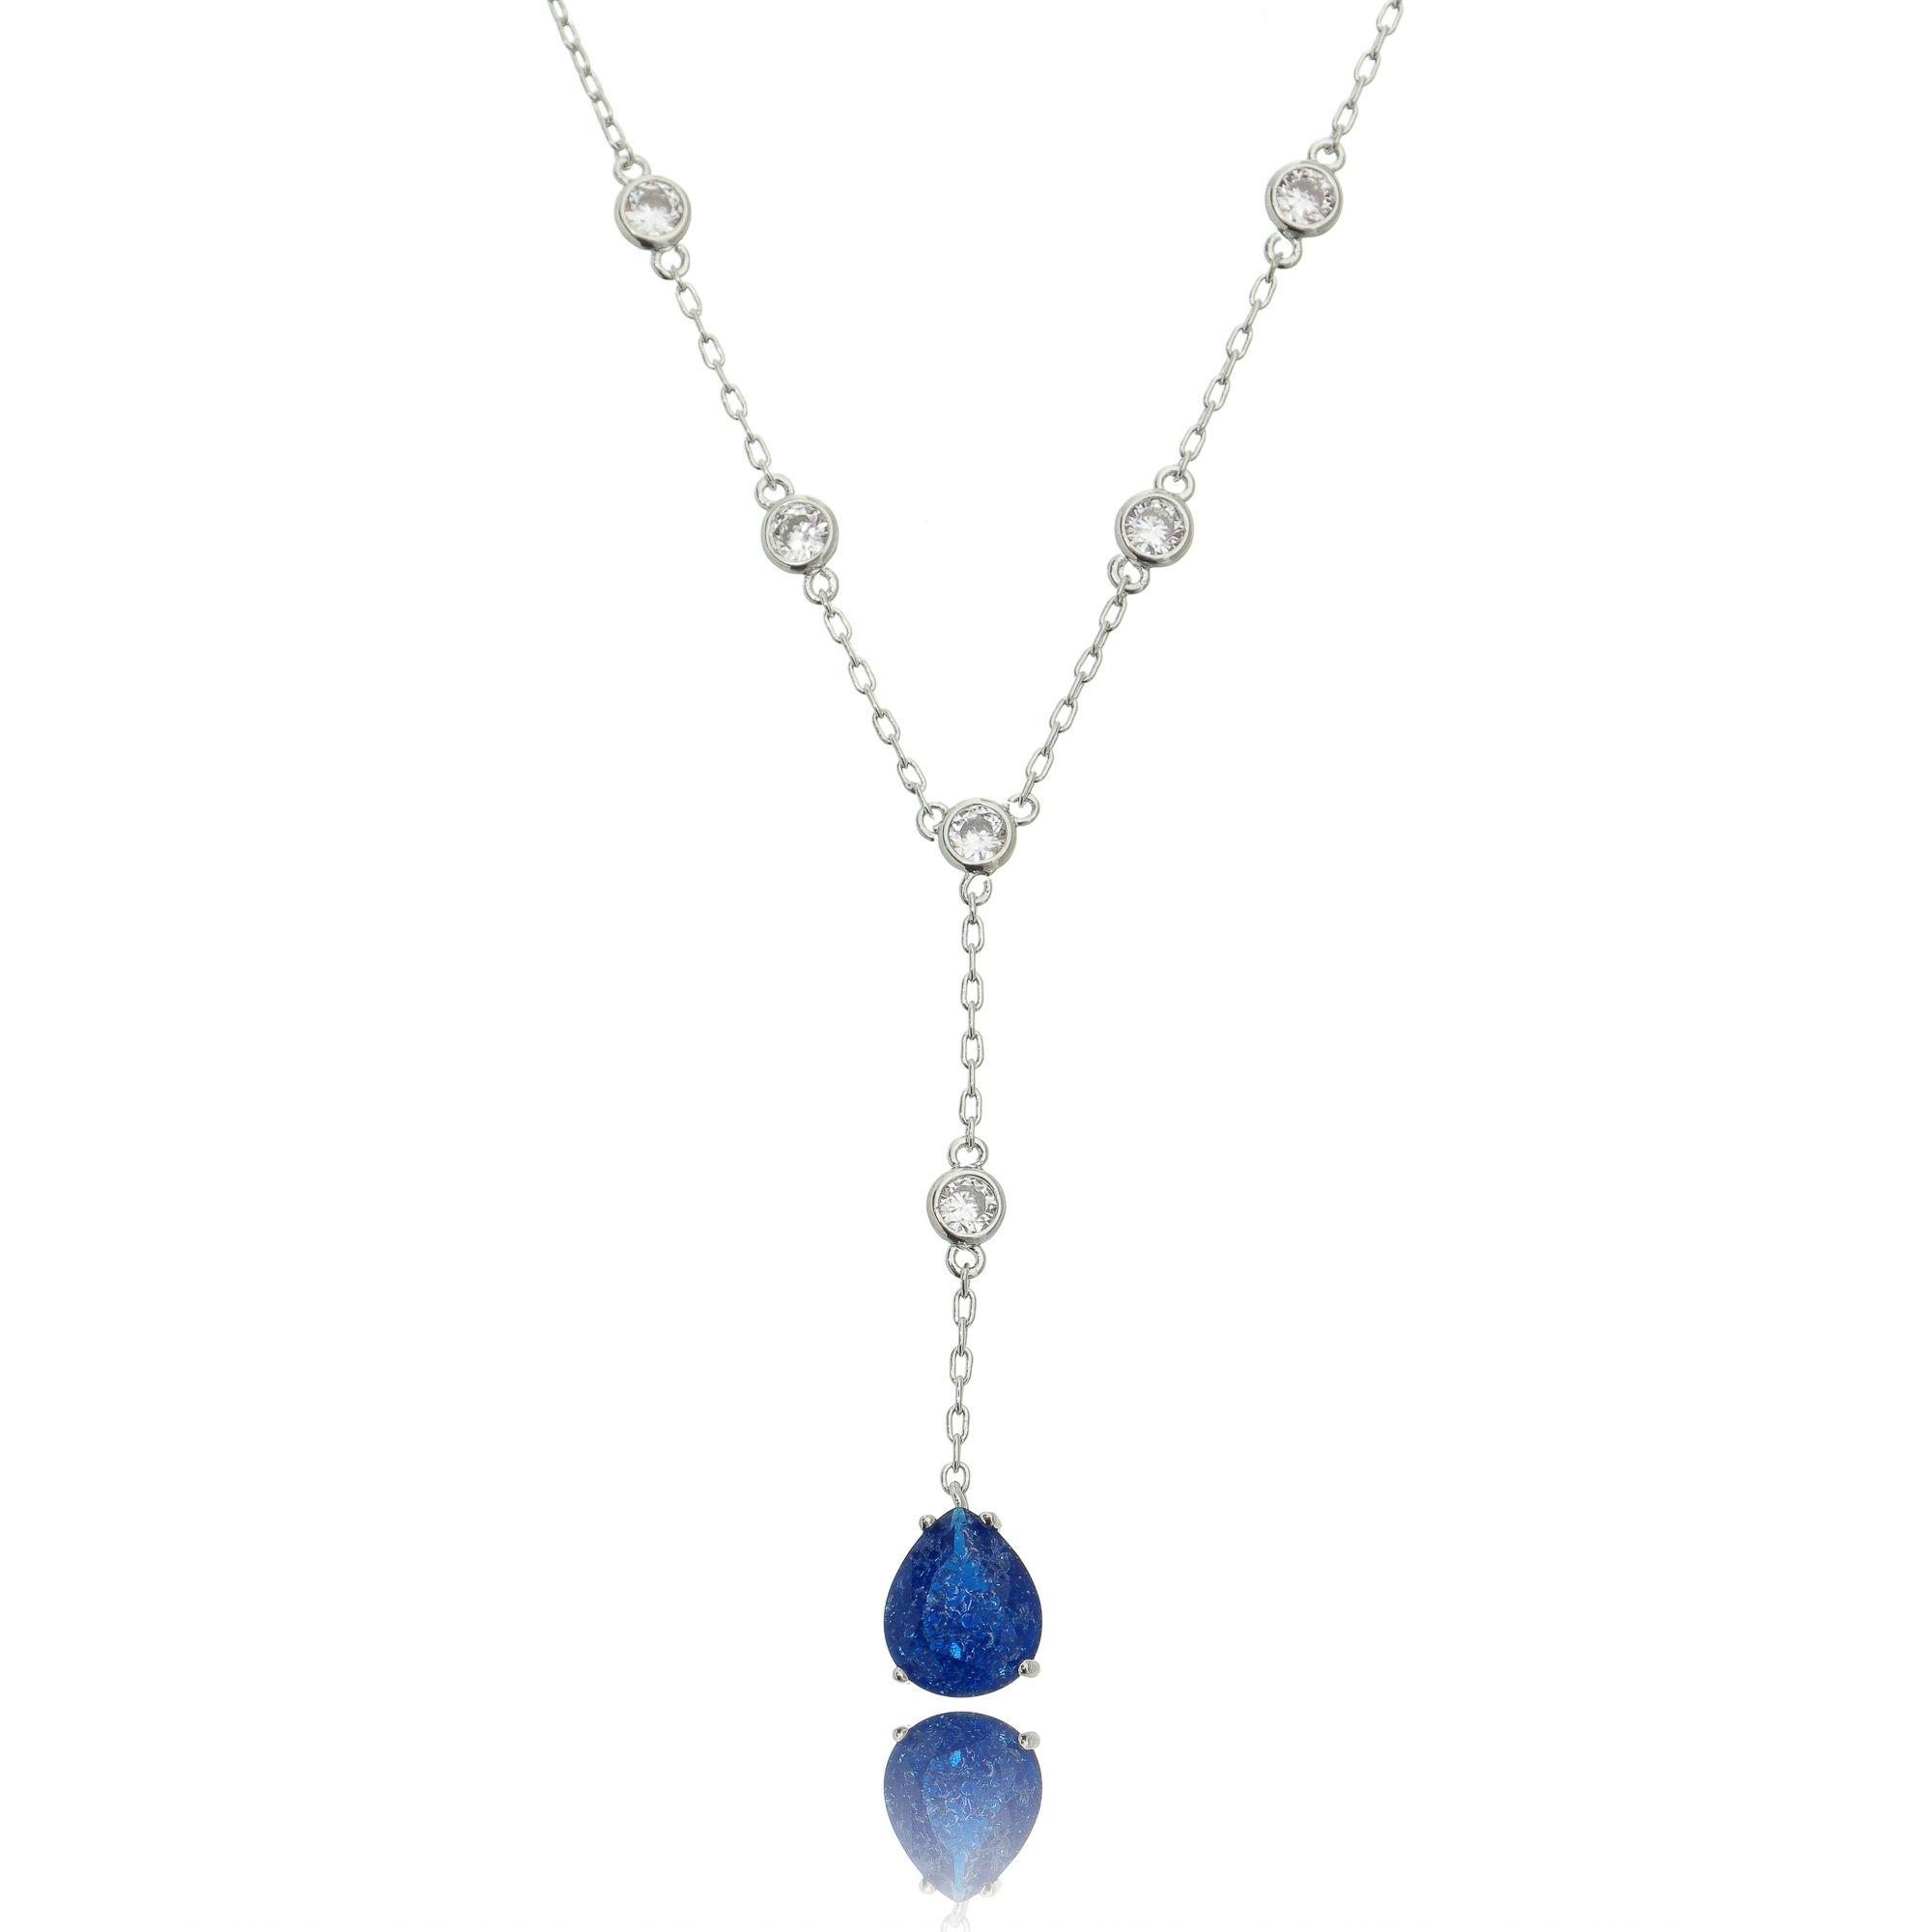 Colar Gravatinha Pedra Fusion Azul Safira Corrente Pontos de Luz Semijoia Ródio Branco  - Soloyou